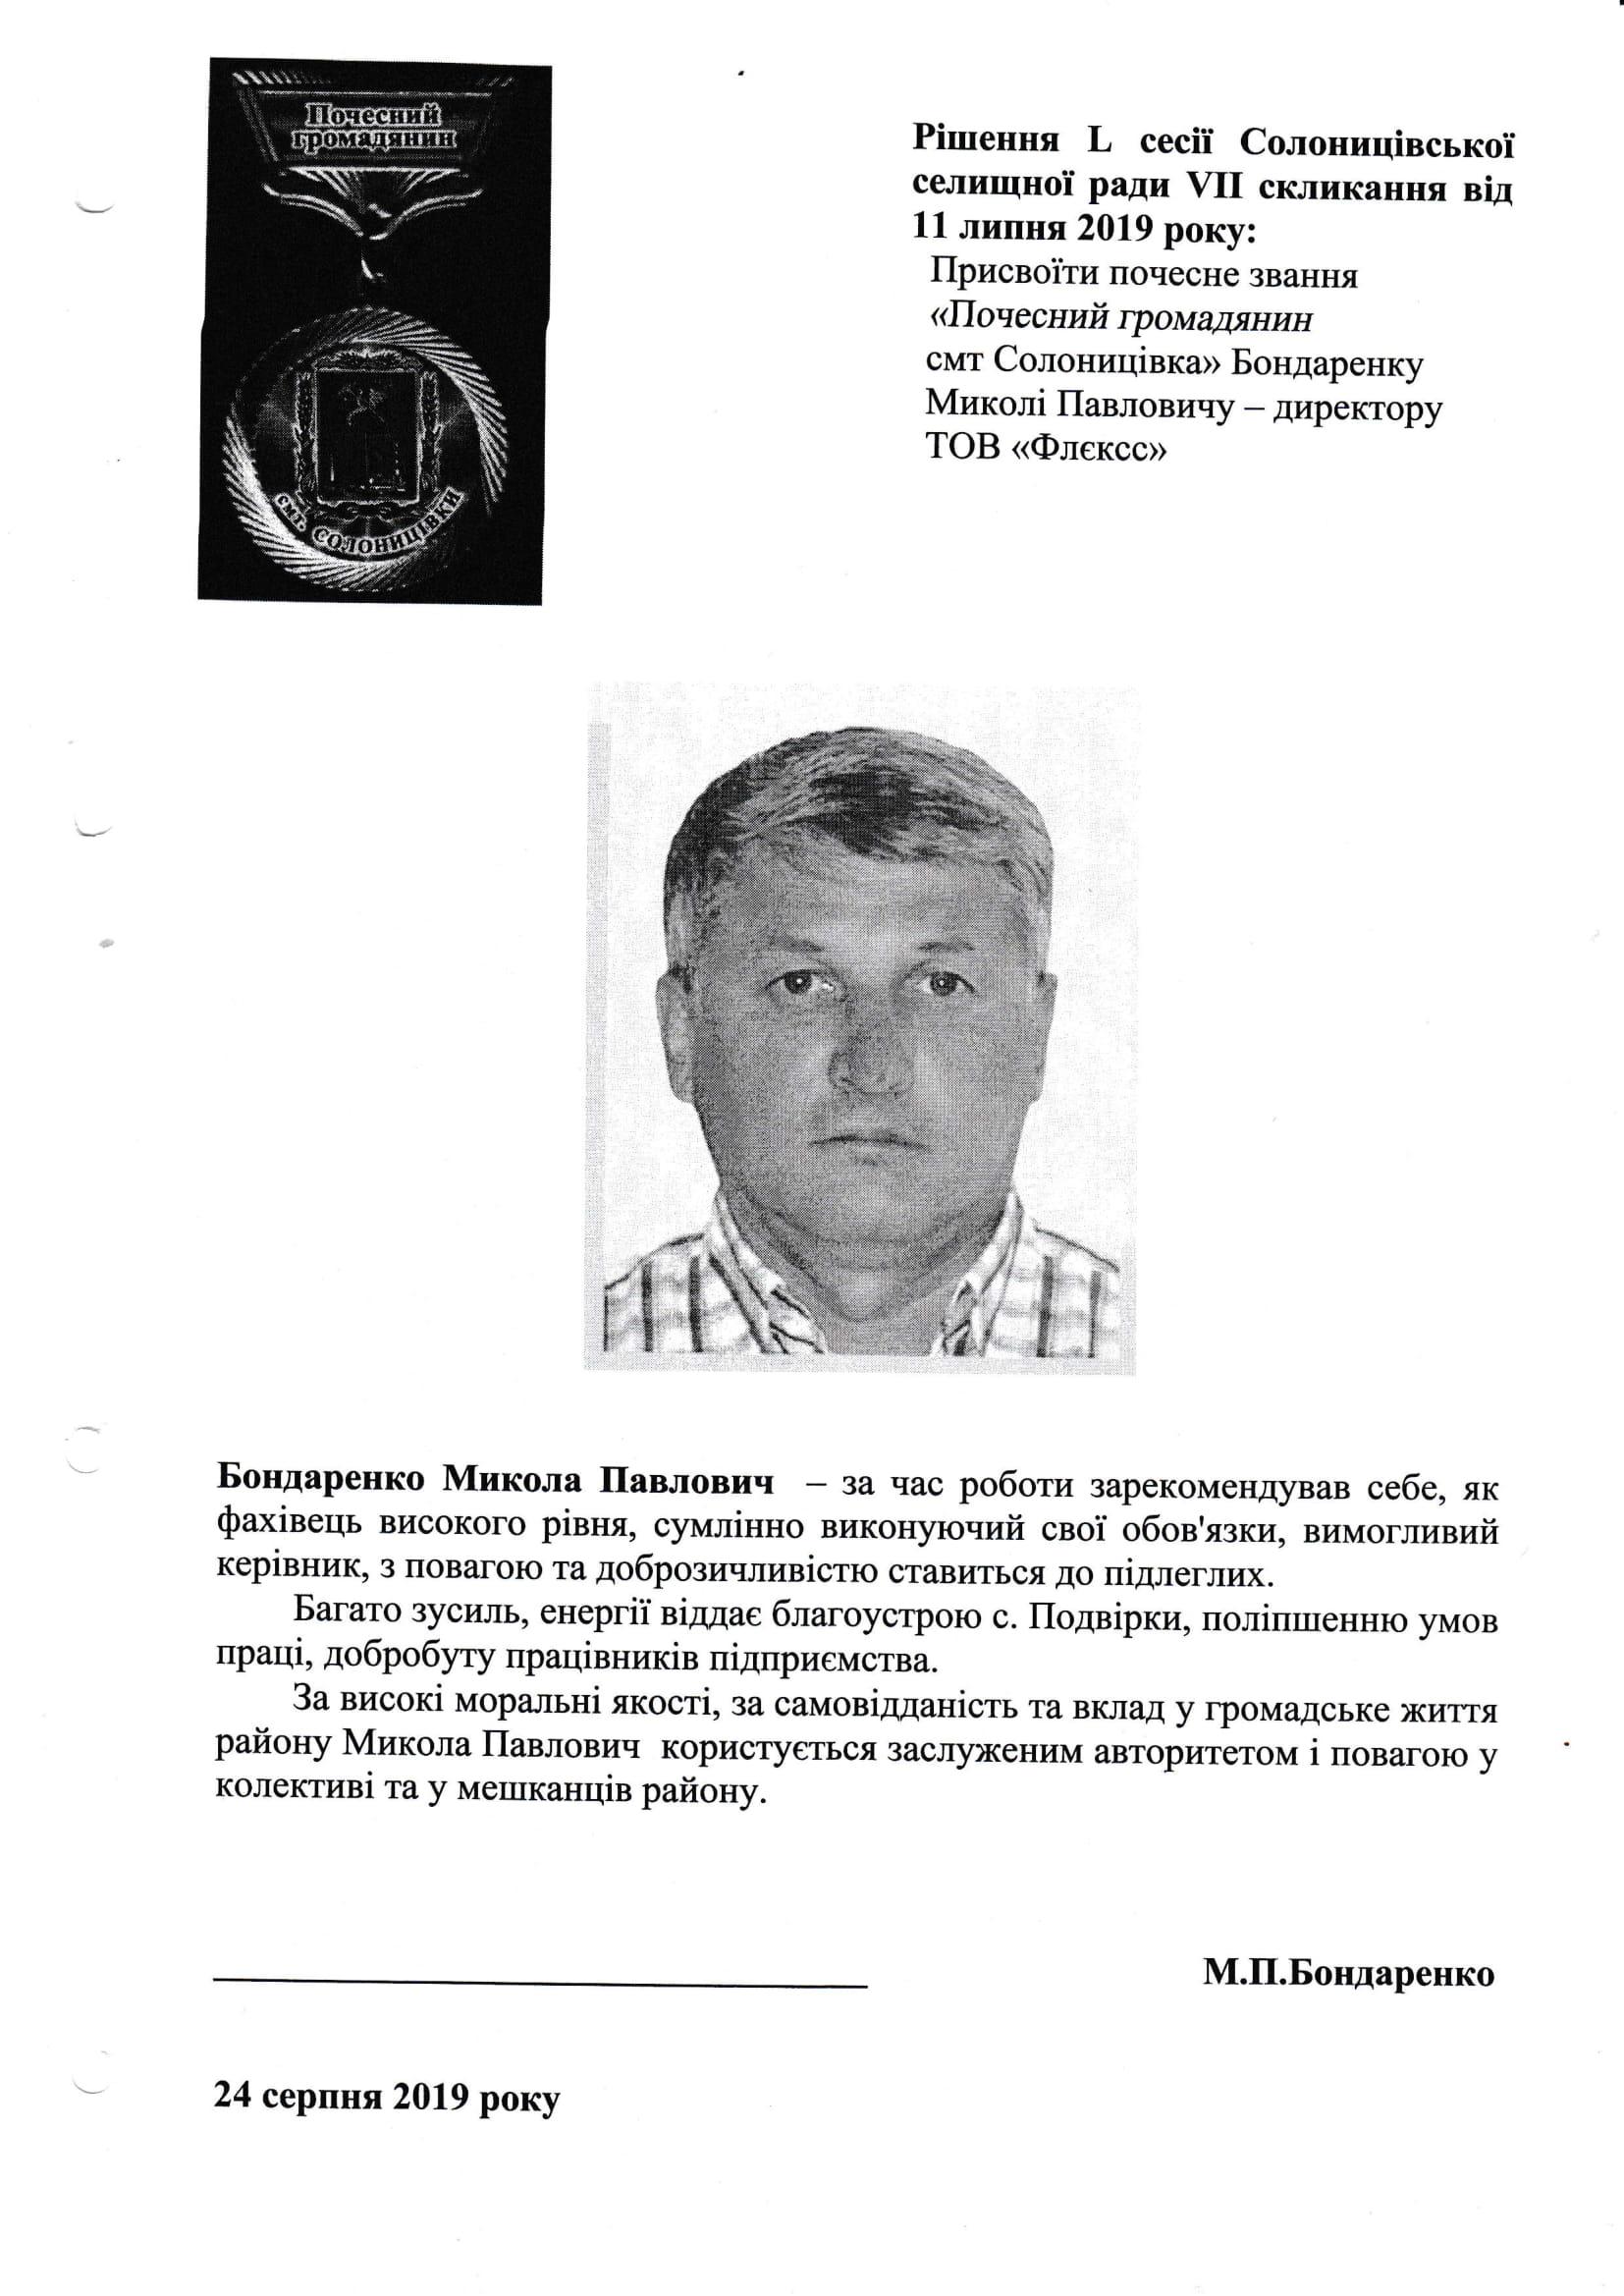 Бондаренко Микола Павлович